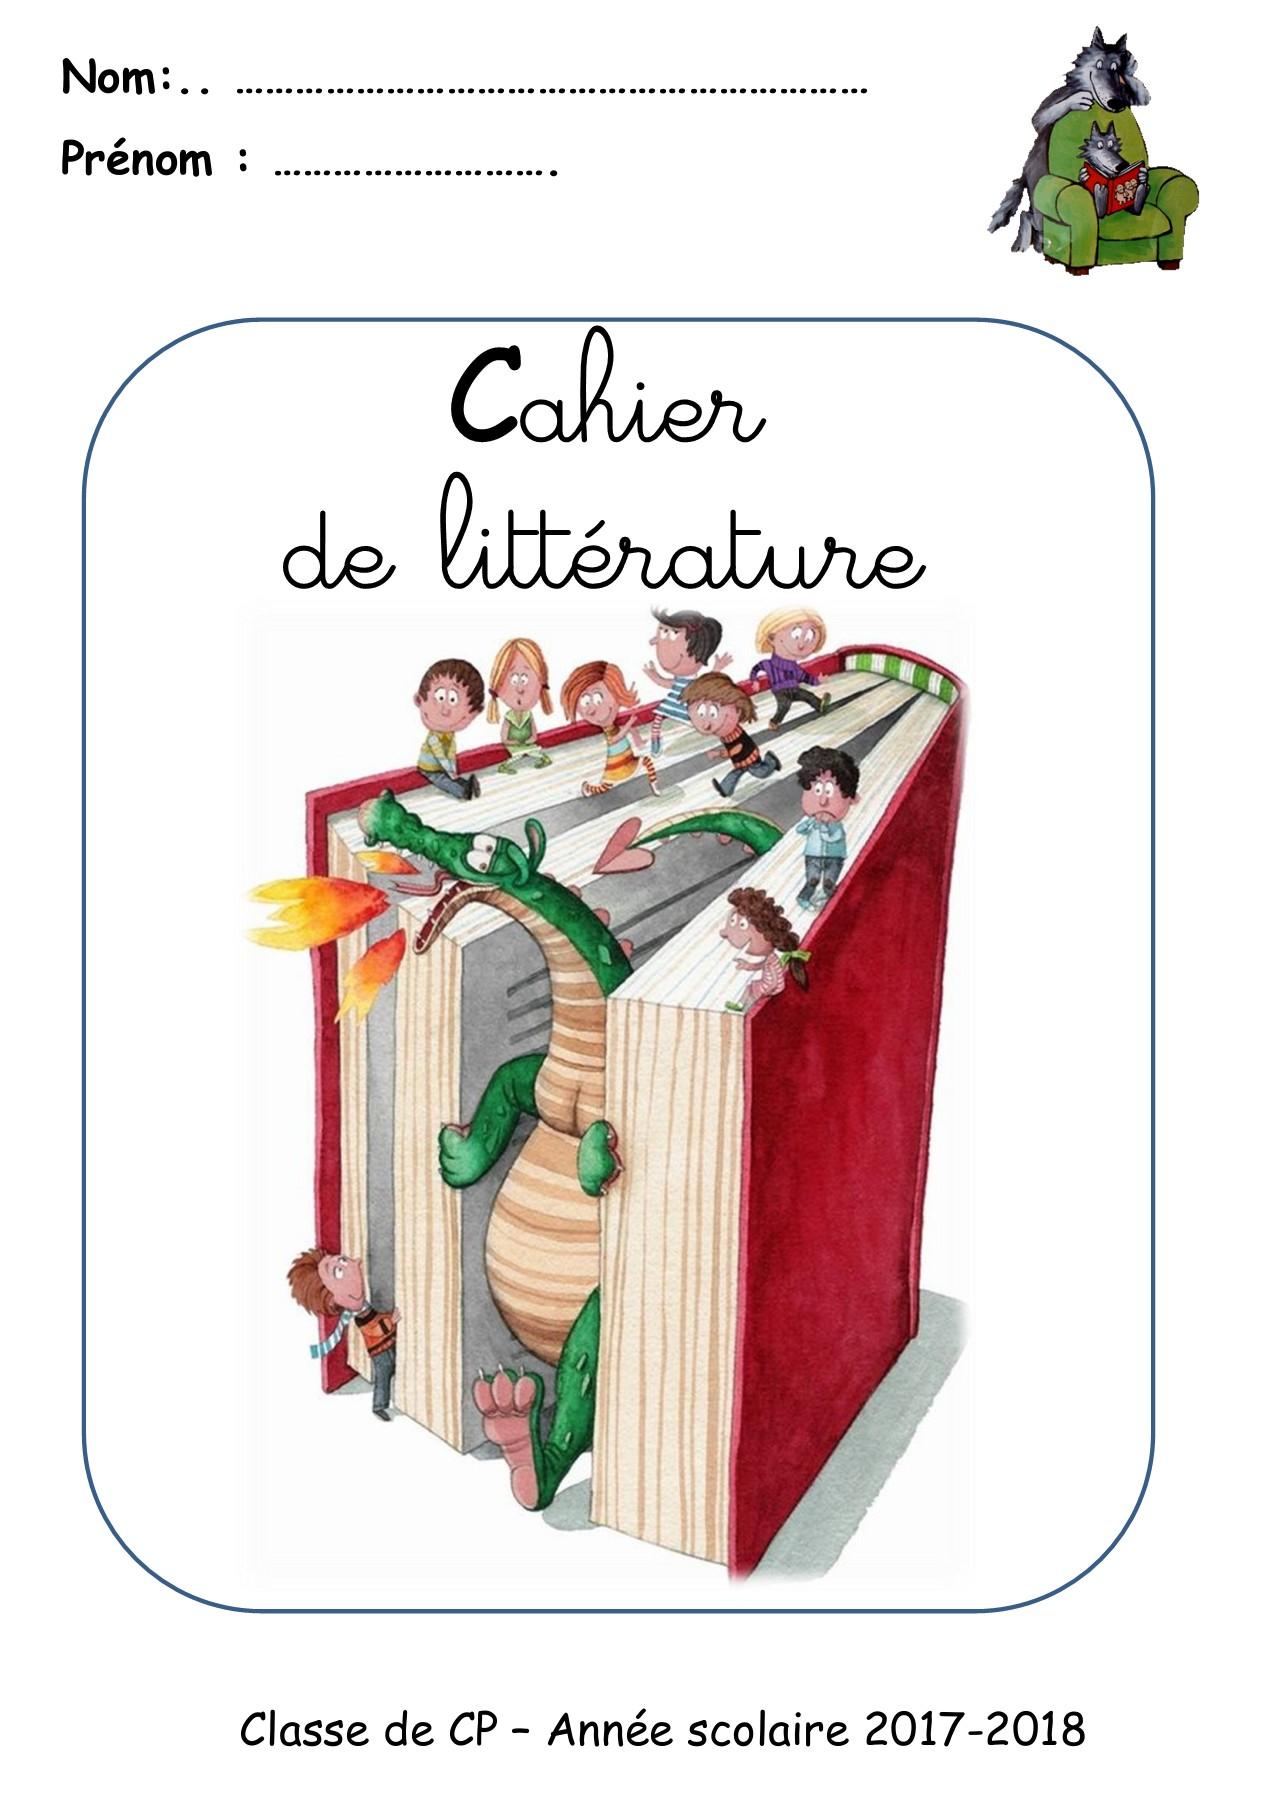 Page De Garde Cahier De Littérature : garde, cahier, littérature, PAGE-DE-GARDE-GRANDS-CAHIERS-2016-2017-CP, Flipbook, Roula.zakka, FlipHTML5